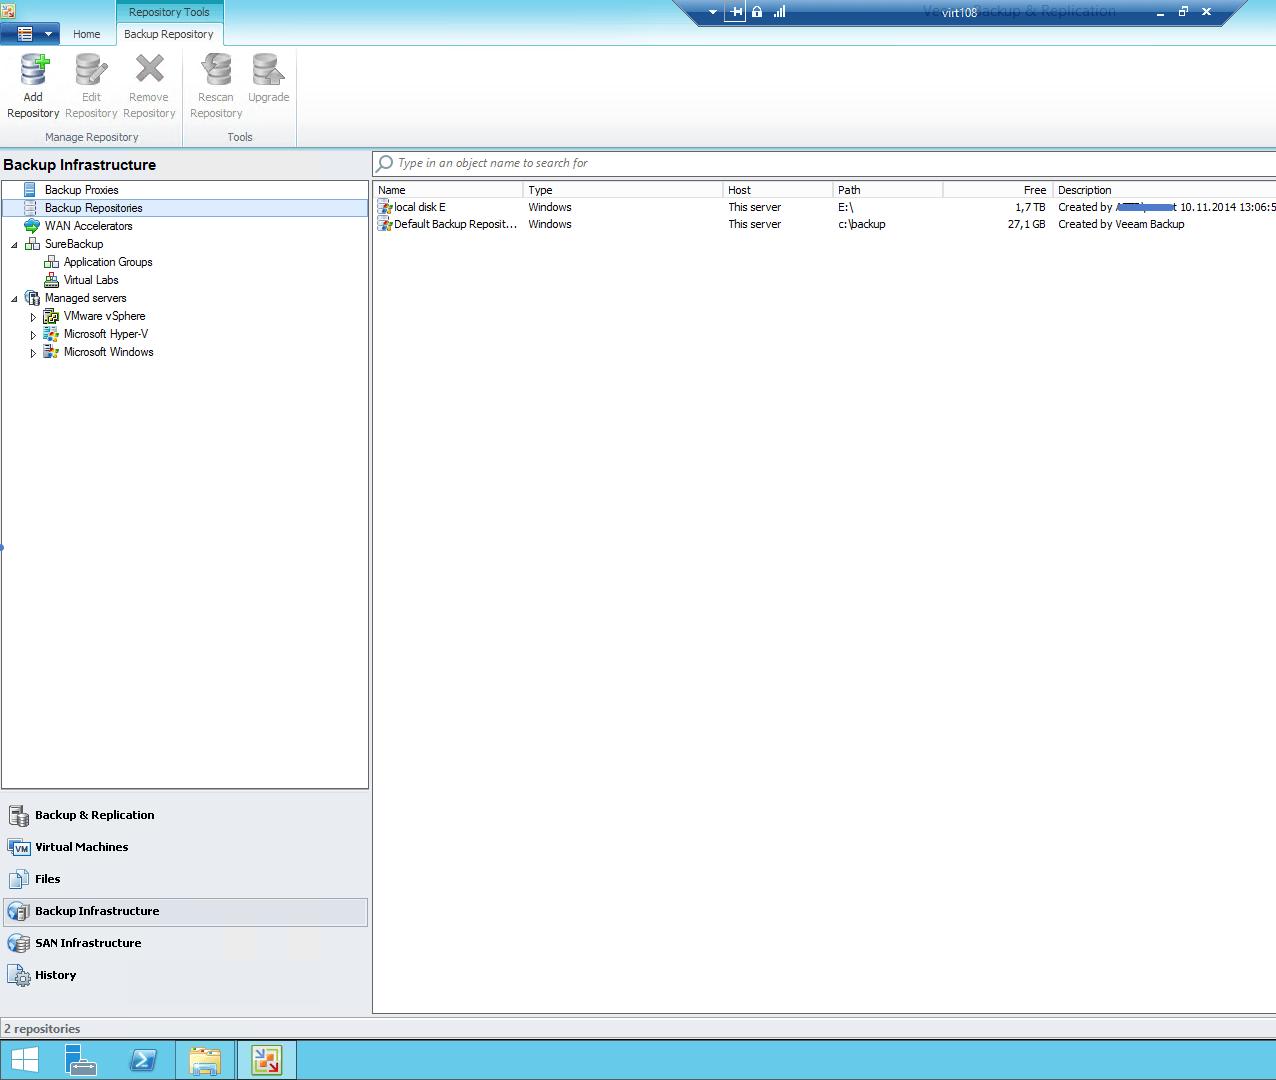 список репозиториев Veeam